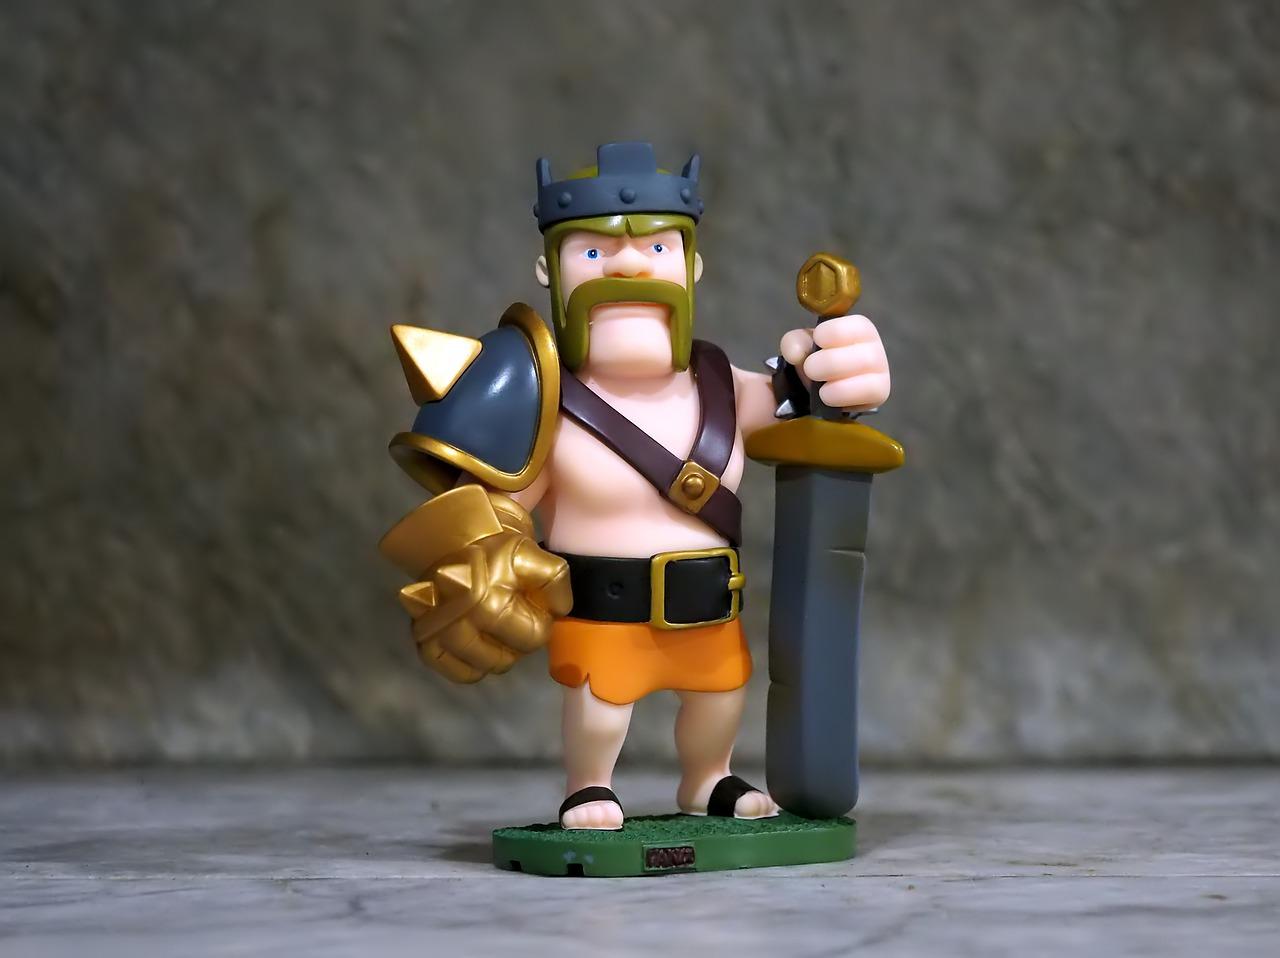 barbarian-king-4423090_1280